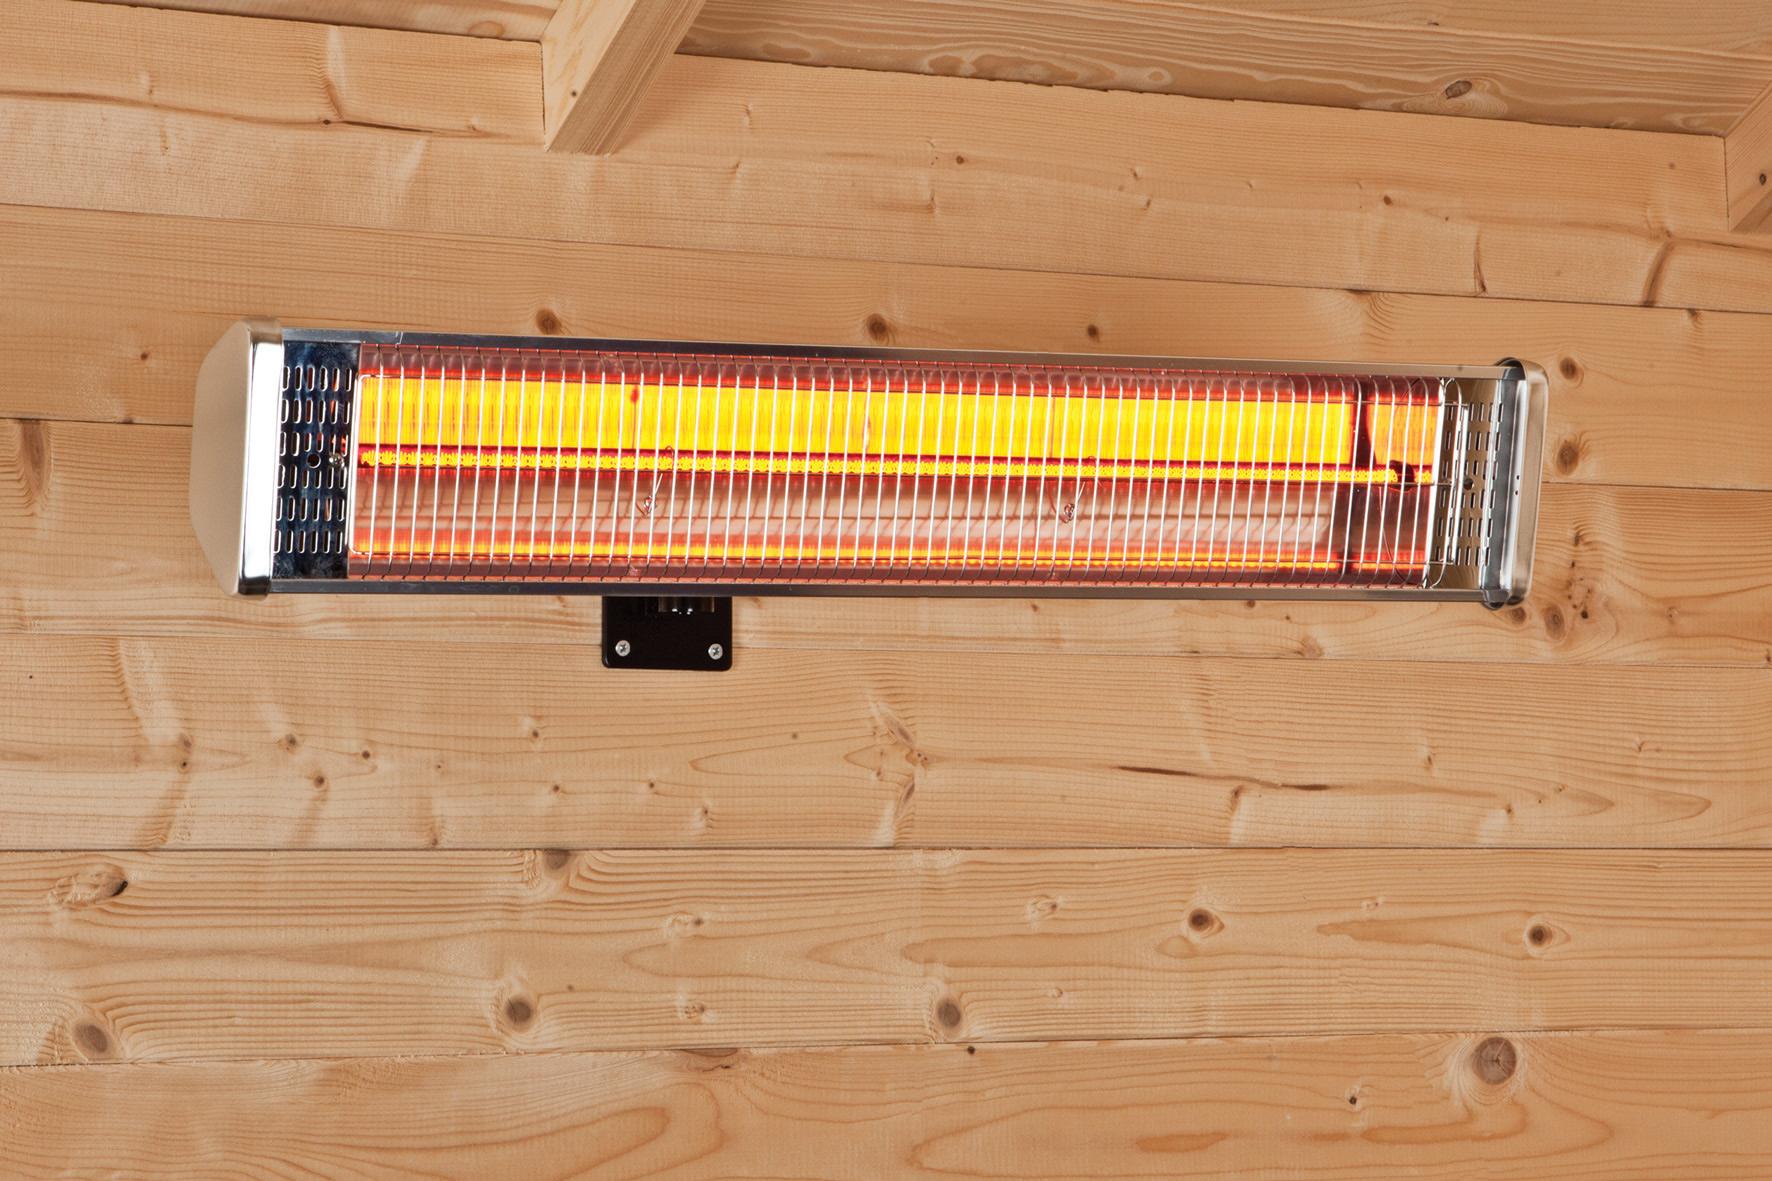 Wall mounted garden building heater